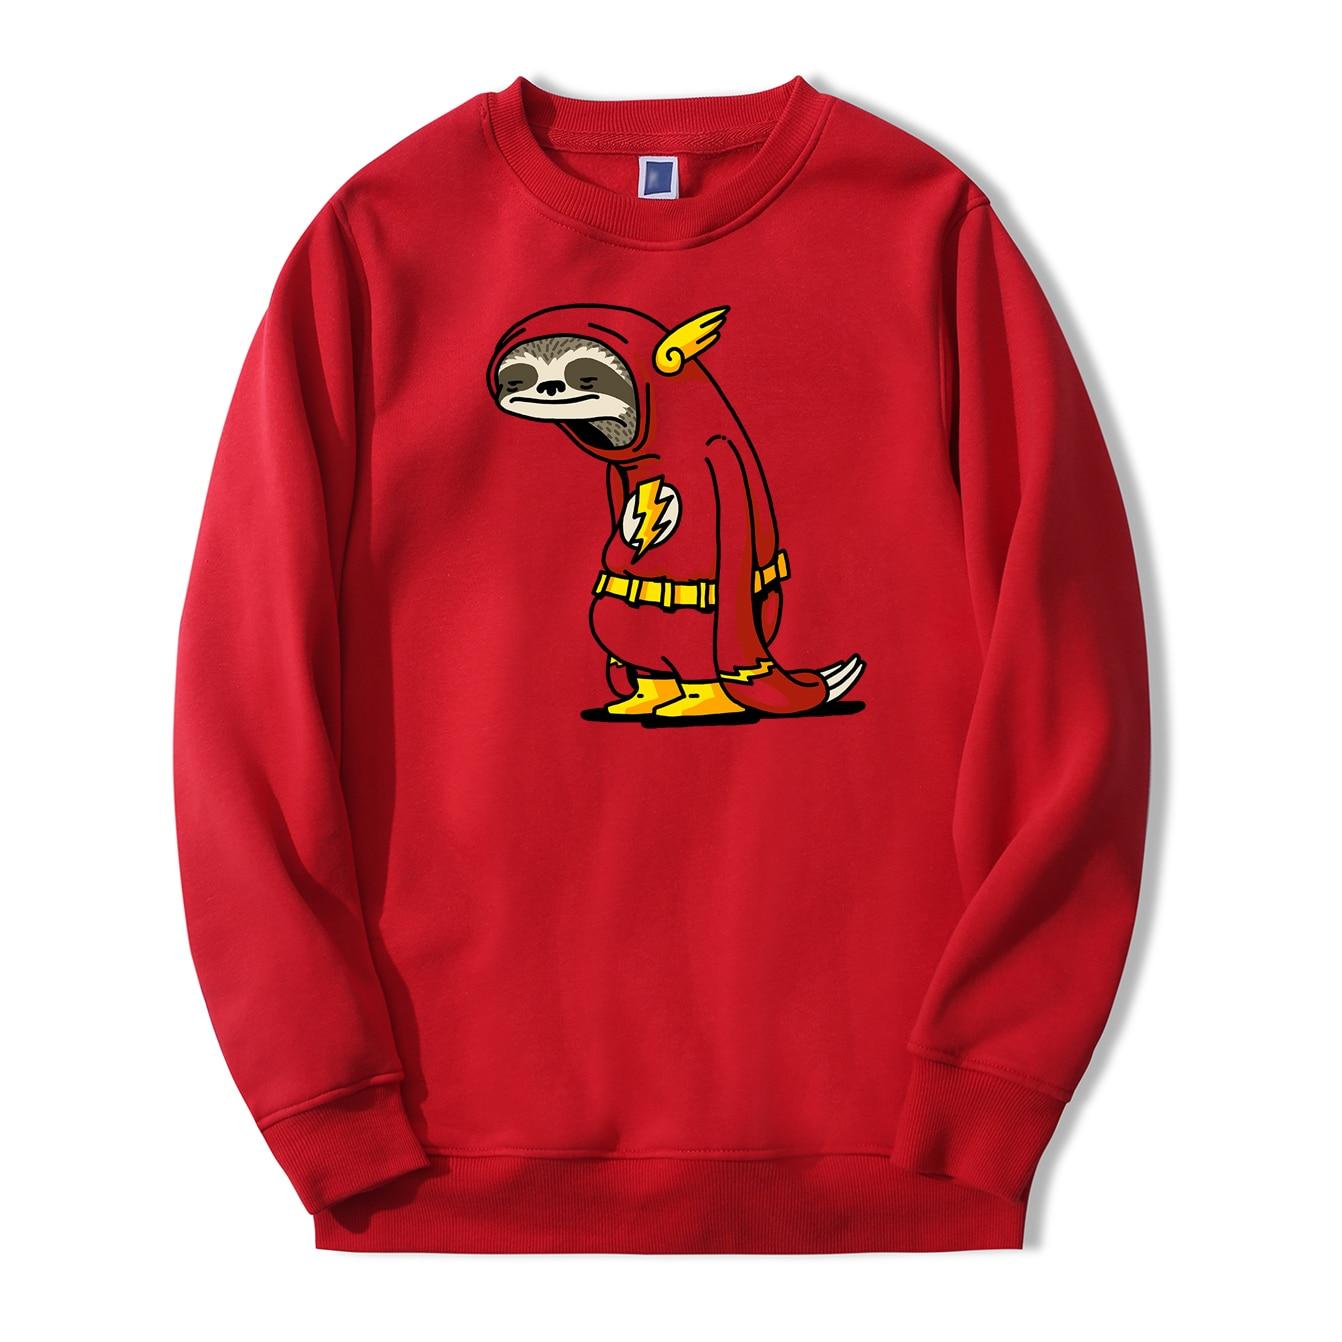 Cartoon The Flash Sweatshirts Men 2019 Autumn Winter Fashion Men Hoodies Fleece High Quality Tracksuit Harajuku Cute Pullover